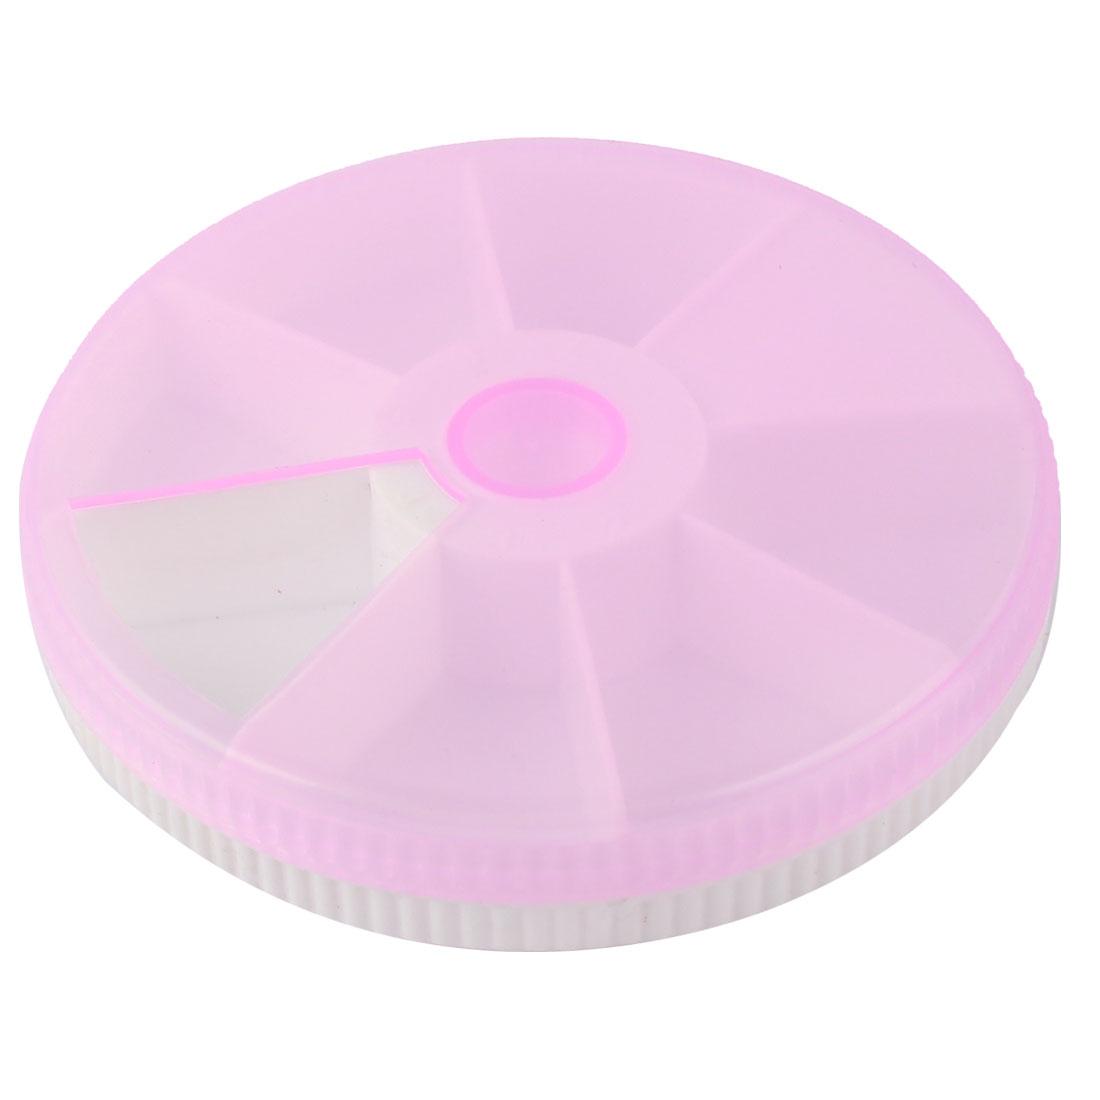 Home Plastic Round 7 Compartments Days Medicine Pill Box Case Pillbox Pink